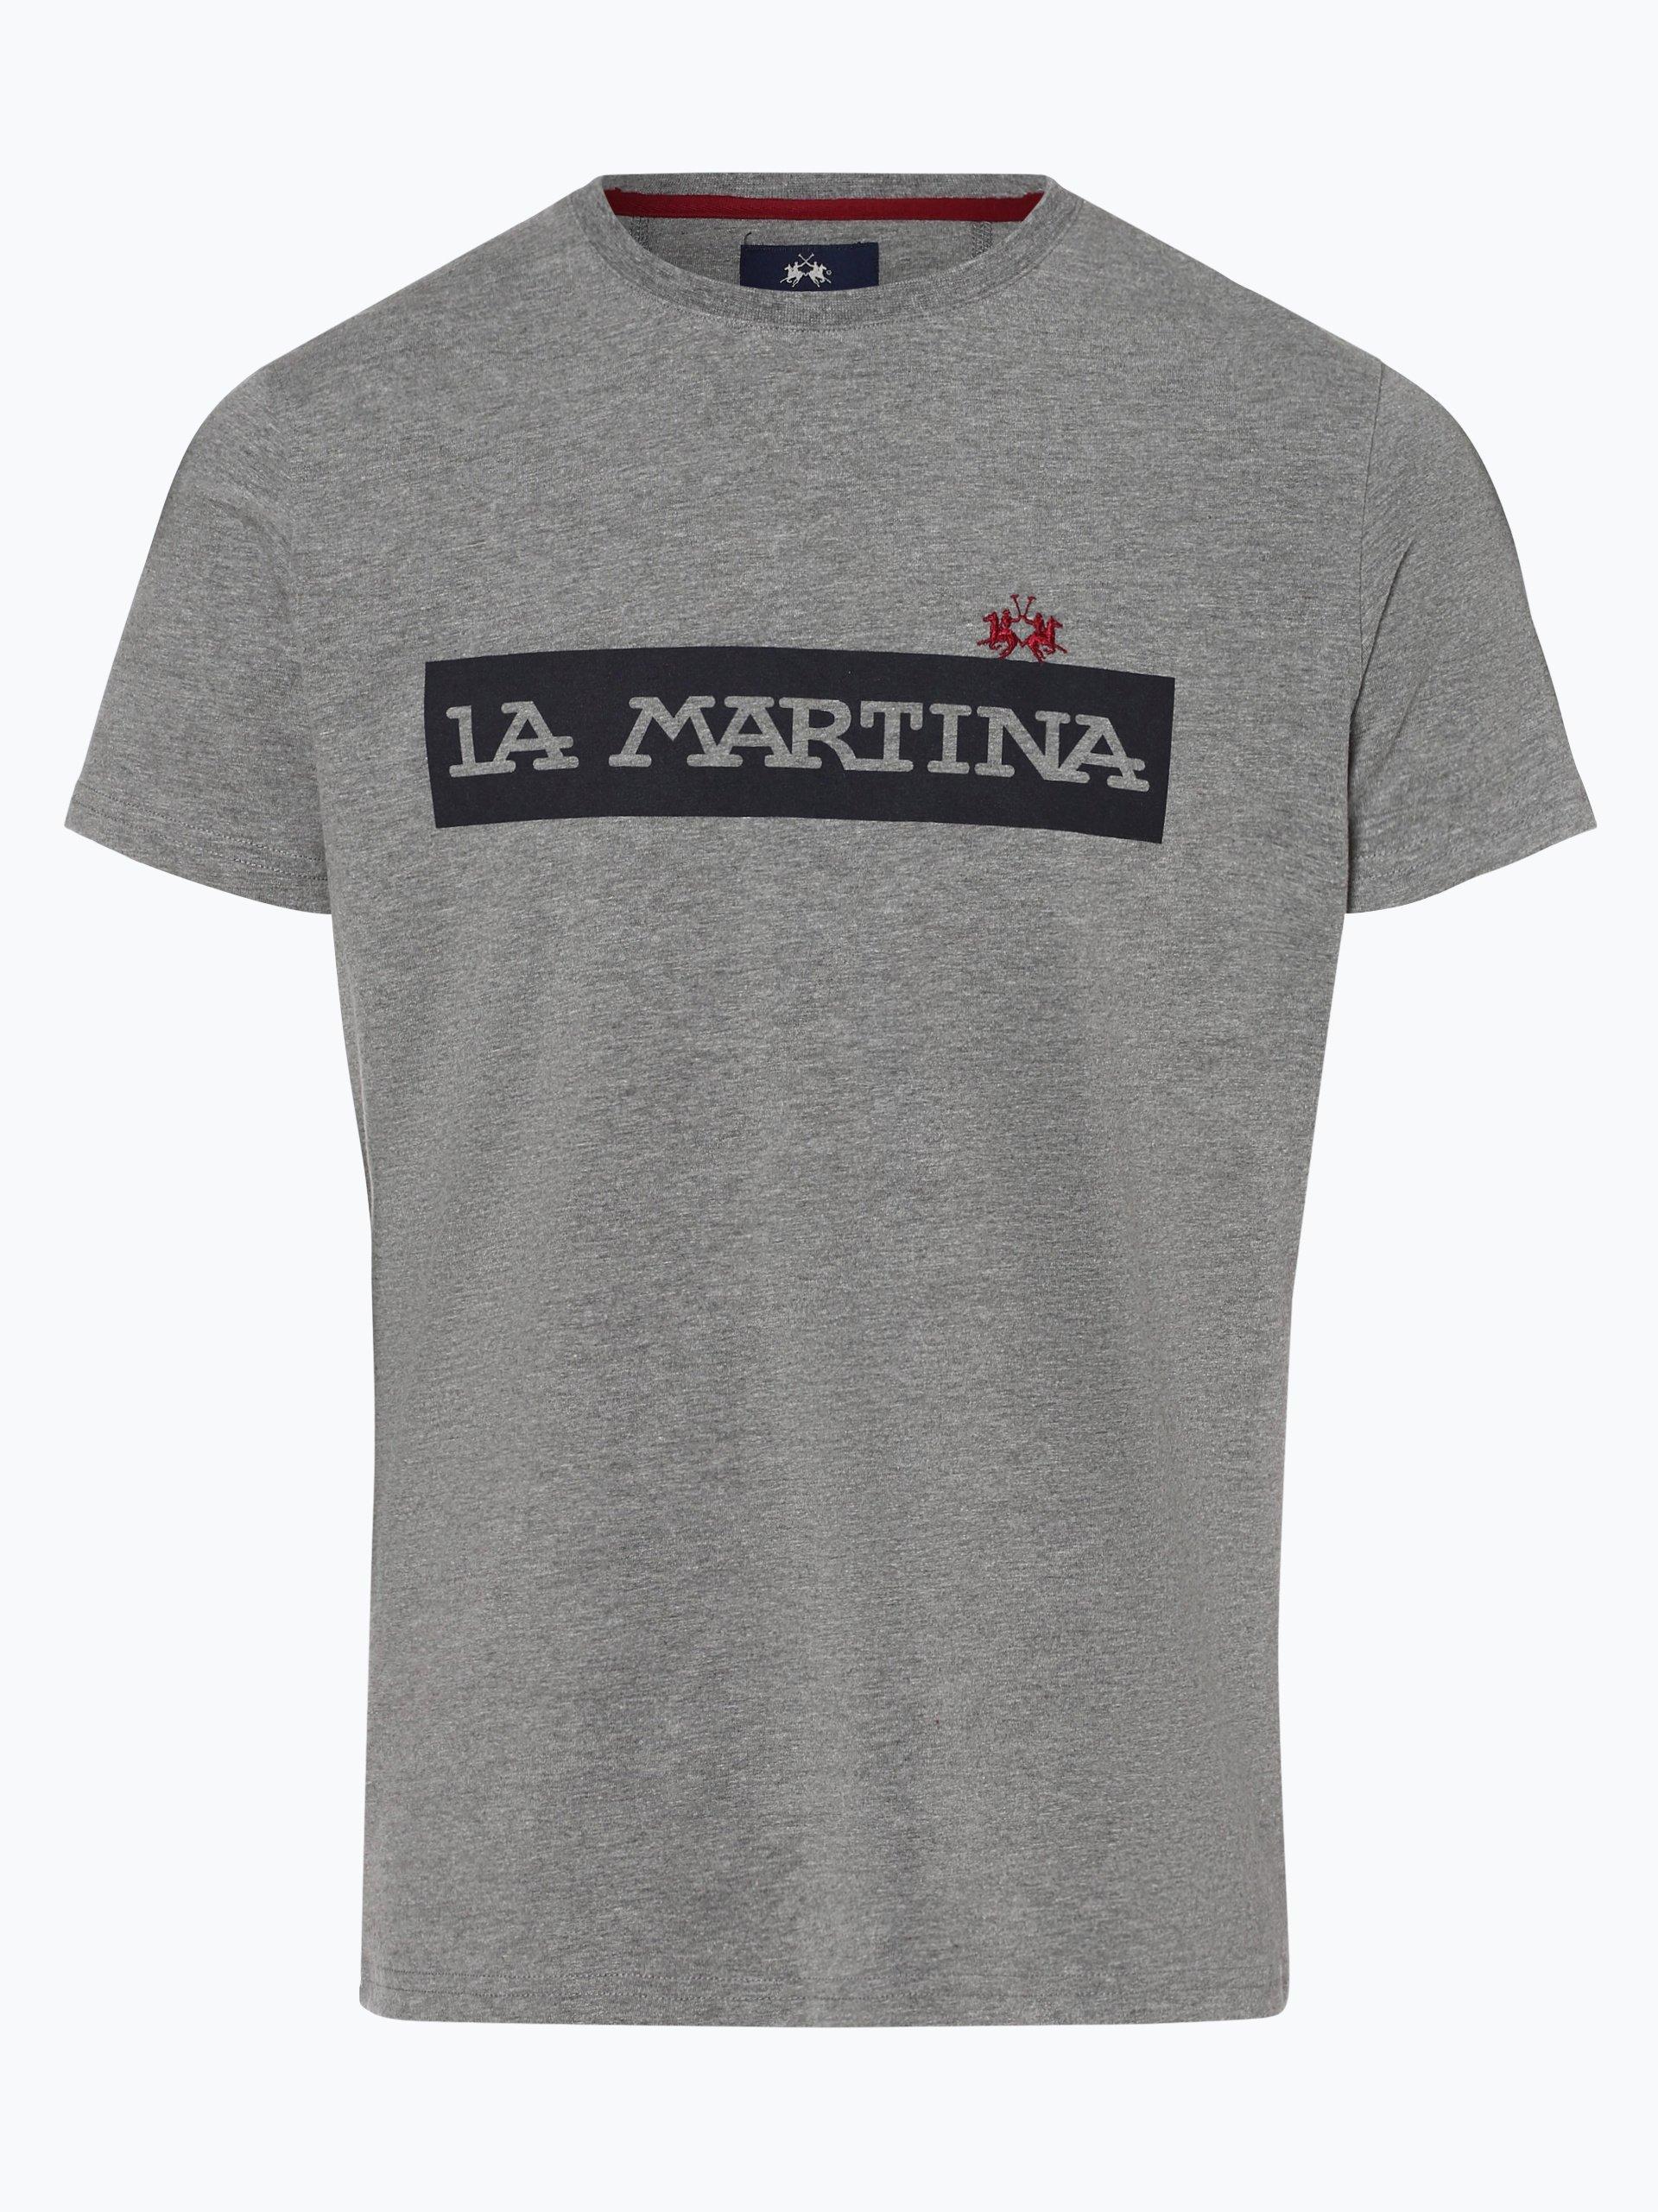 La Martina Herren T-Shirt